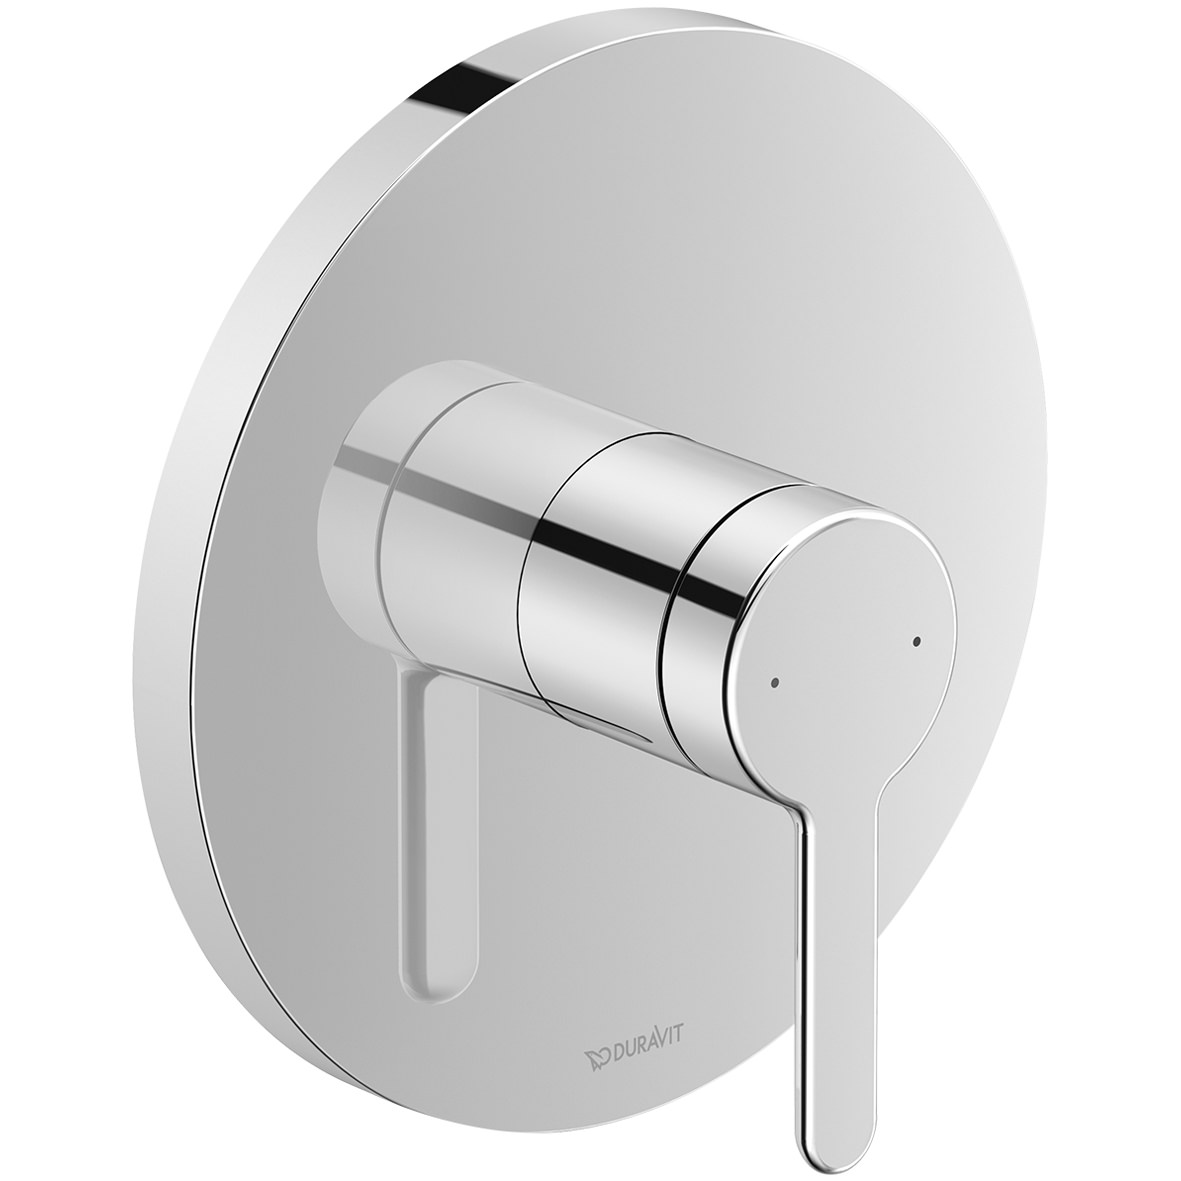 Duravit C.1 Round Concealed Manual Shower Mixer Valve | C14210010010